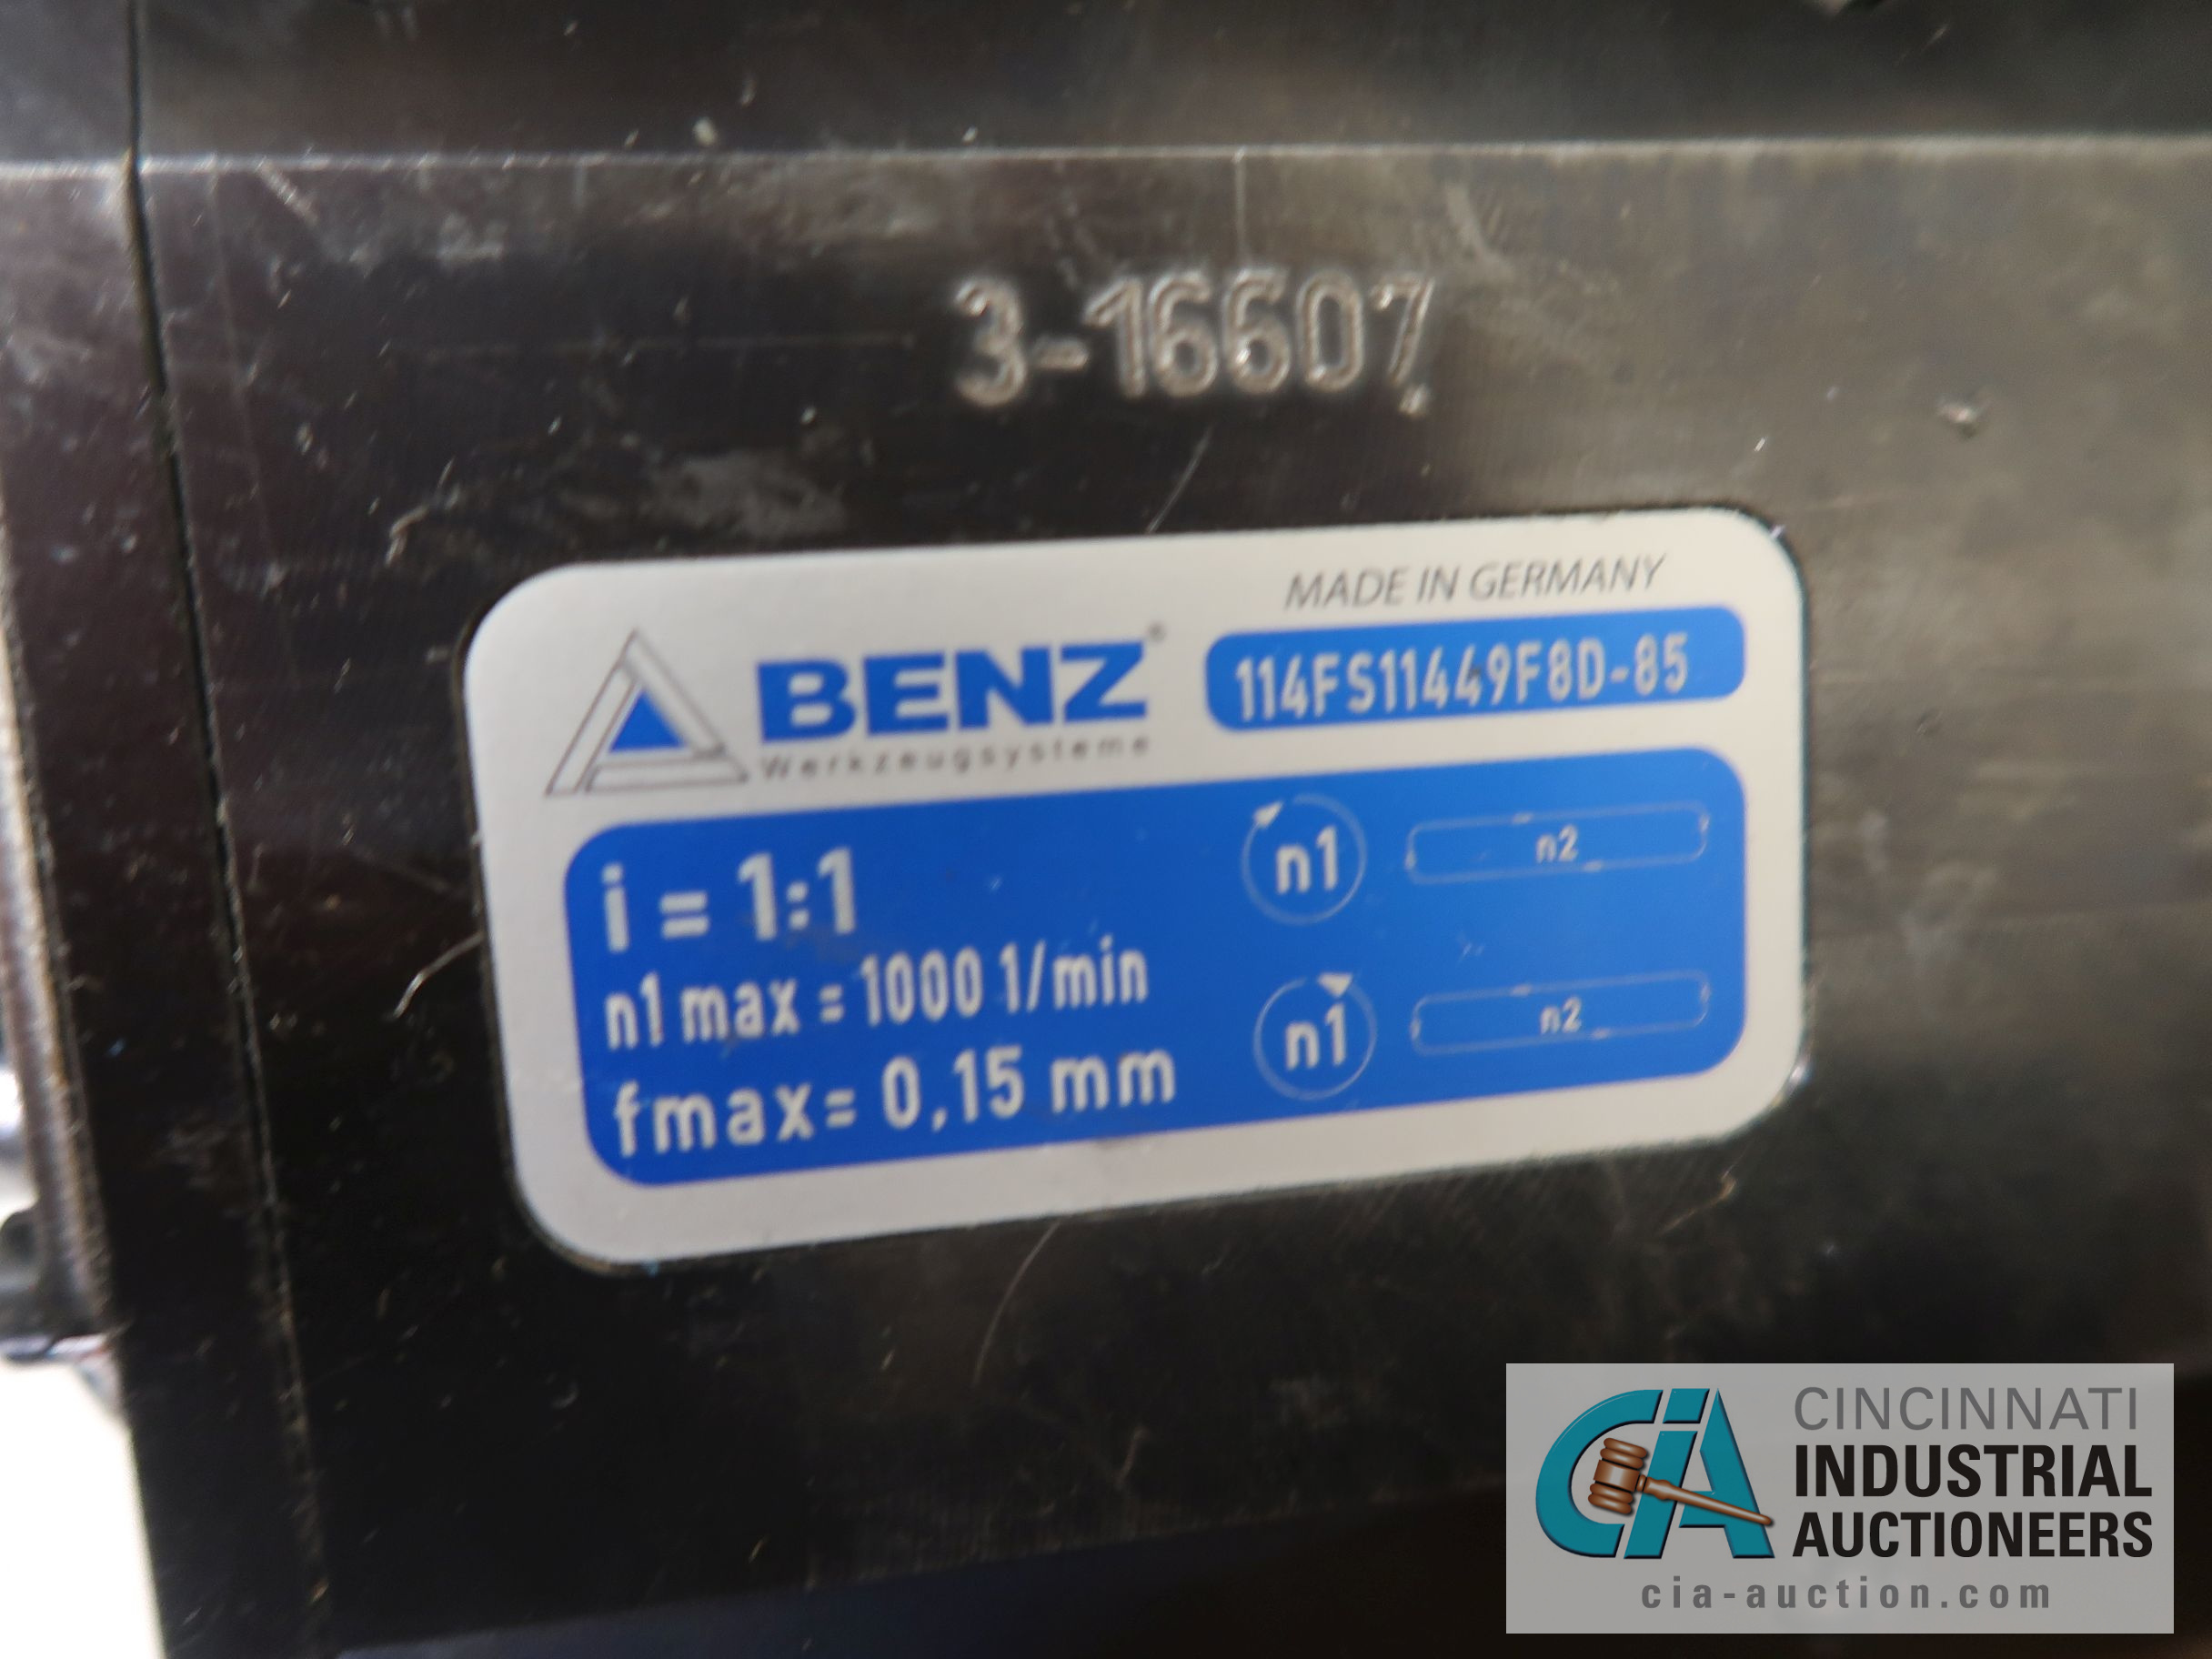 BENZ BMT55 SLOTTING HEAD TURRET; S/N 114FS11449F8D-85 - Image 2 of 2